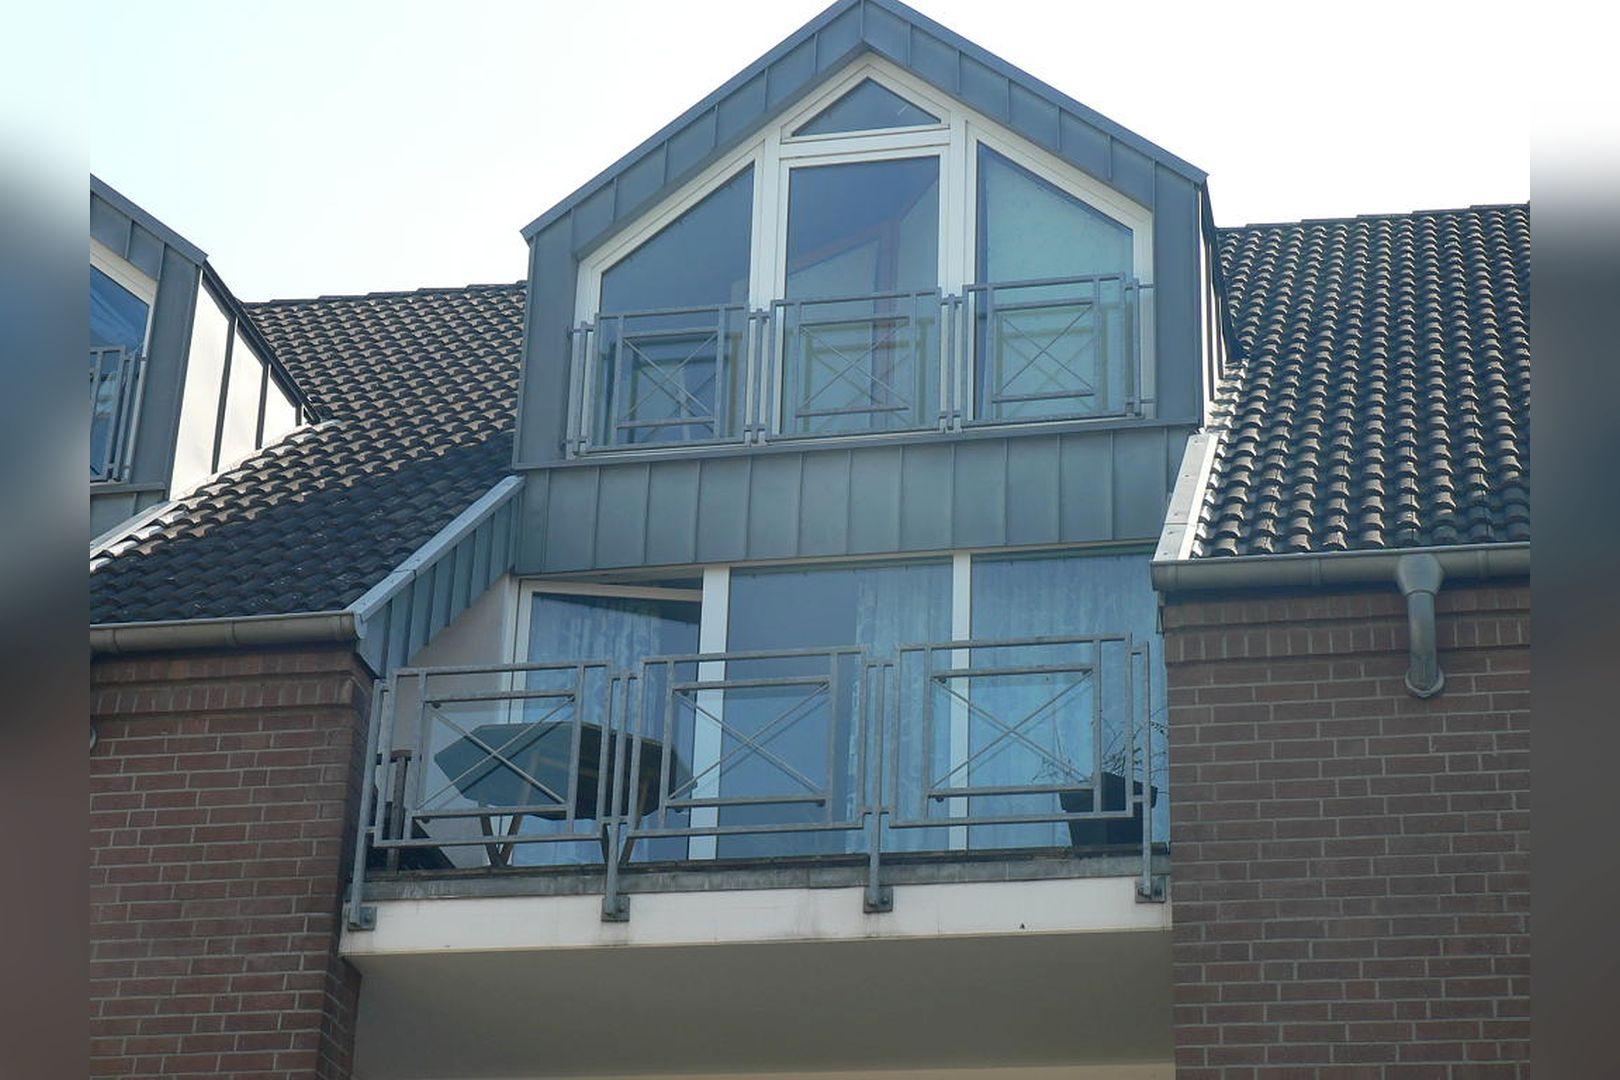 Immobilie Nr.0237 | Uerdinger Str. 77 , 40668 Meerbusch - Lank